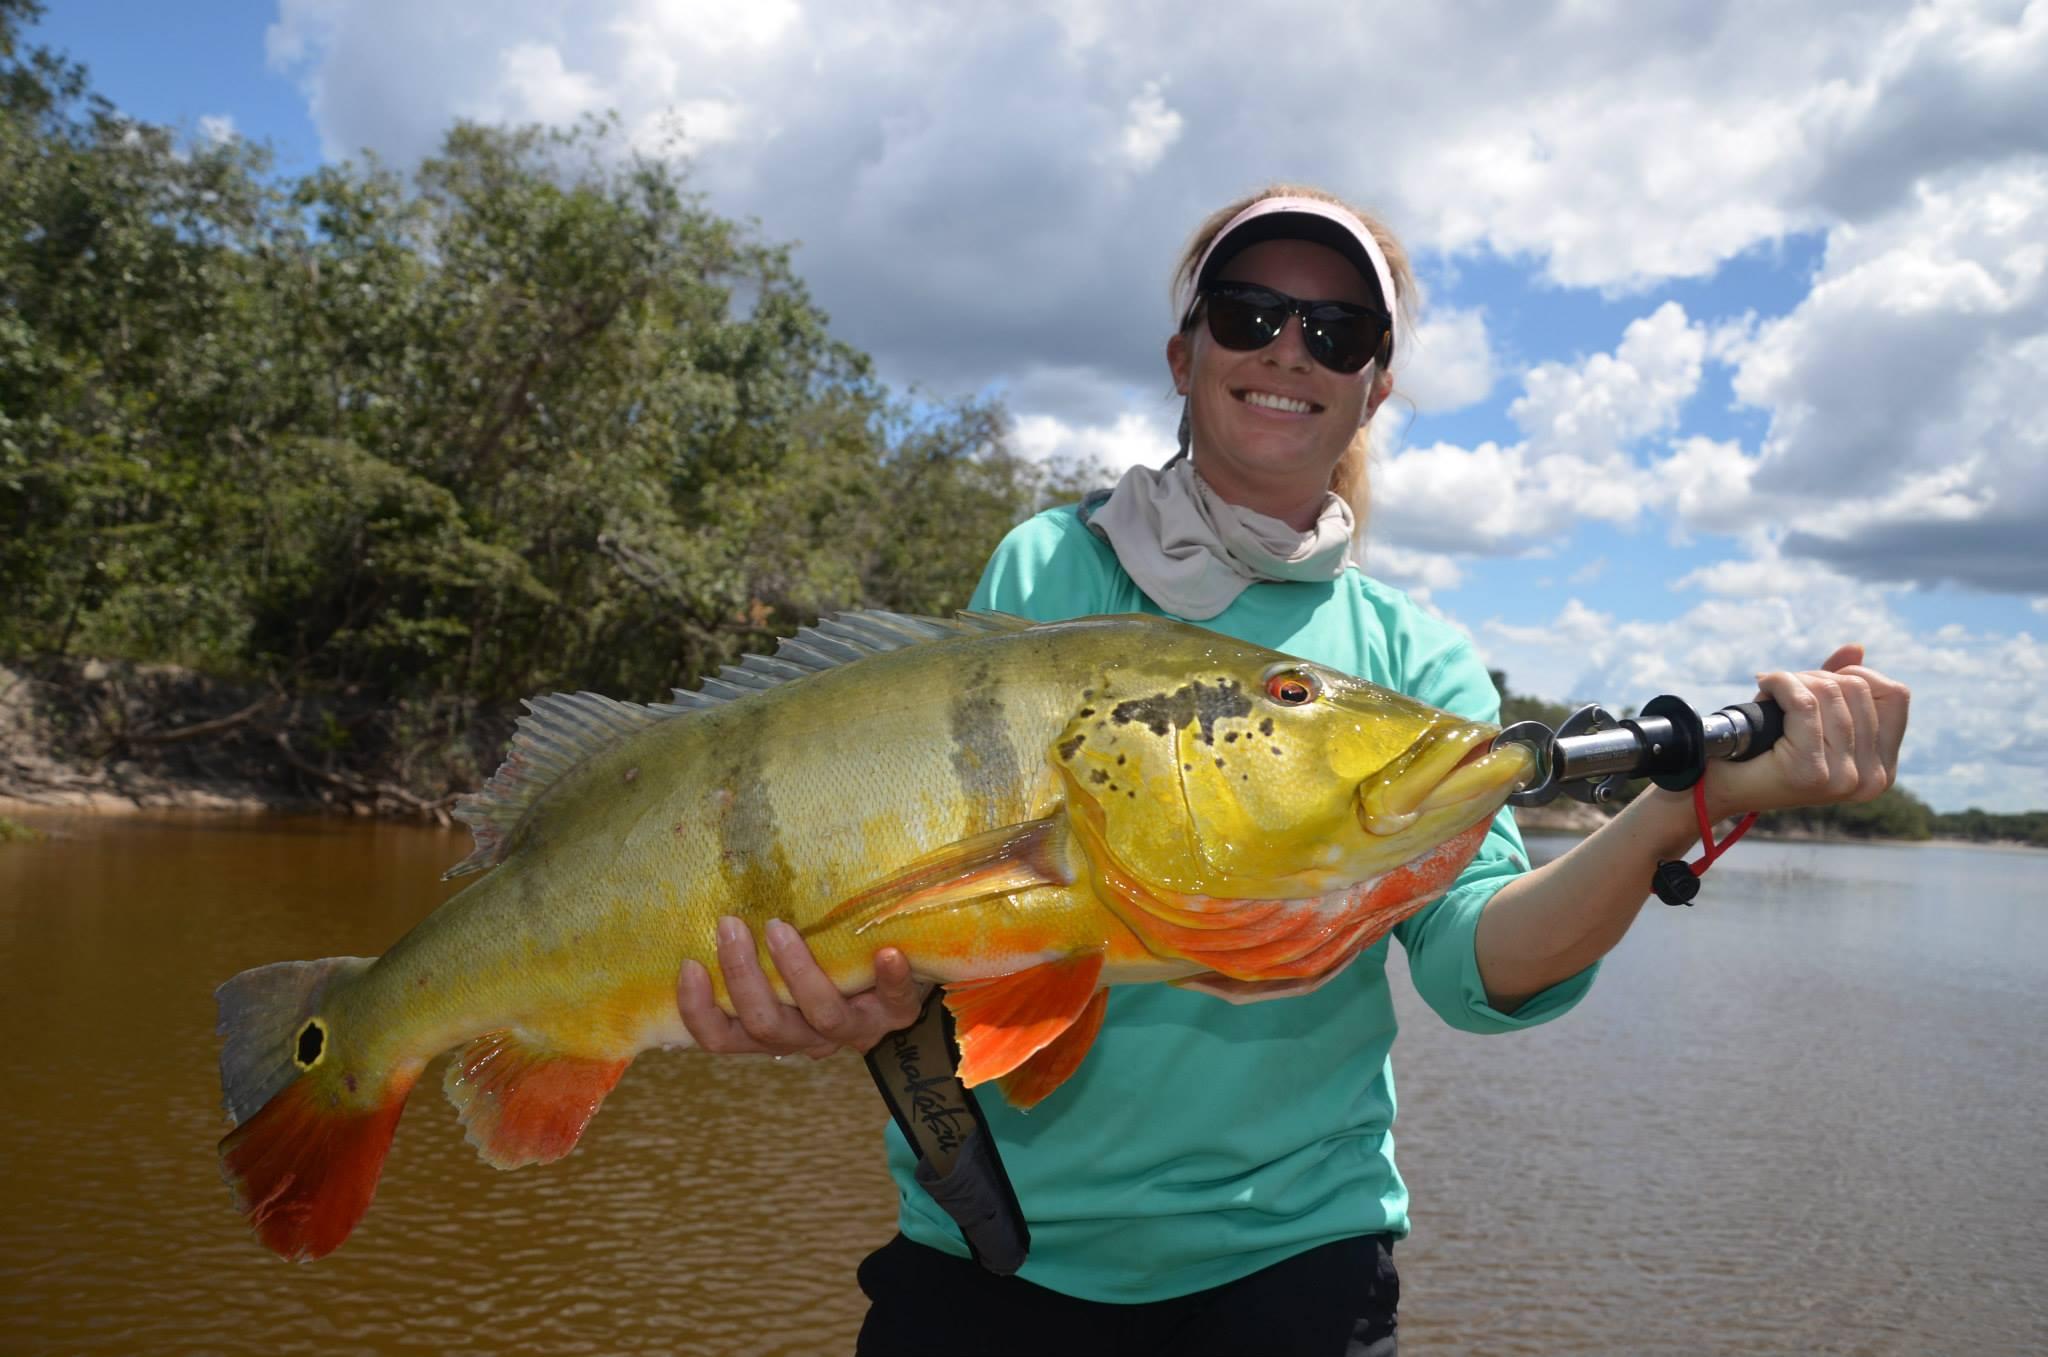 Fly girl q a alex lovett woodsum fly life magazine for Fly girl fishing charters